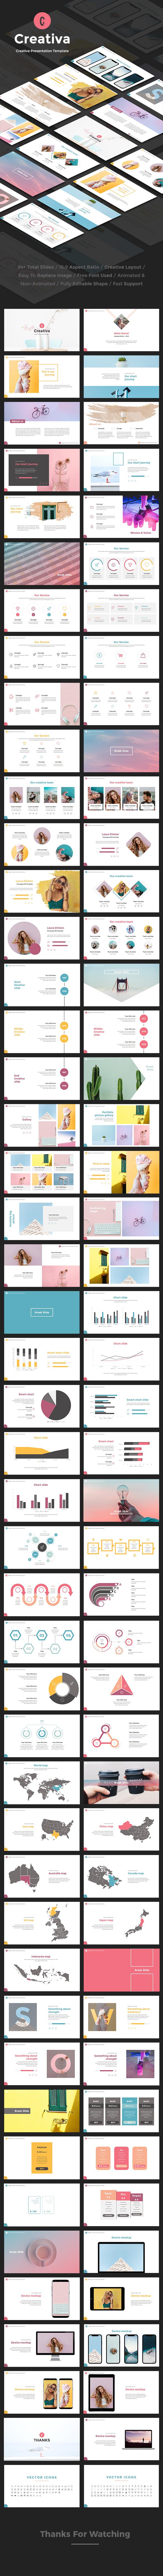 Creativa Google Slides - Google Slides Presentation Templates